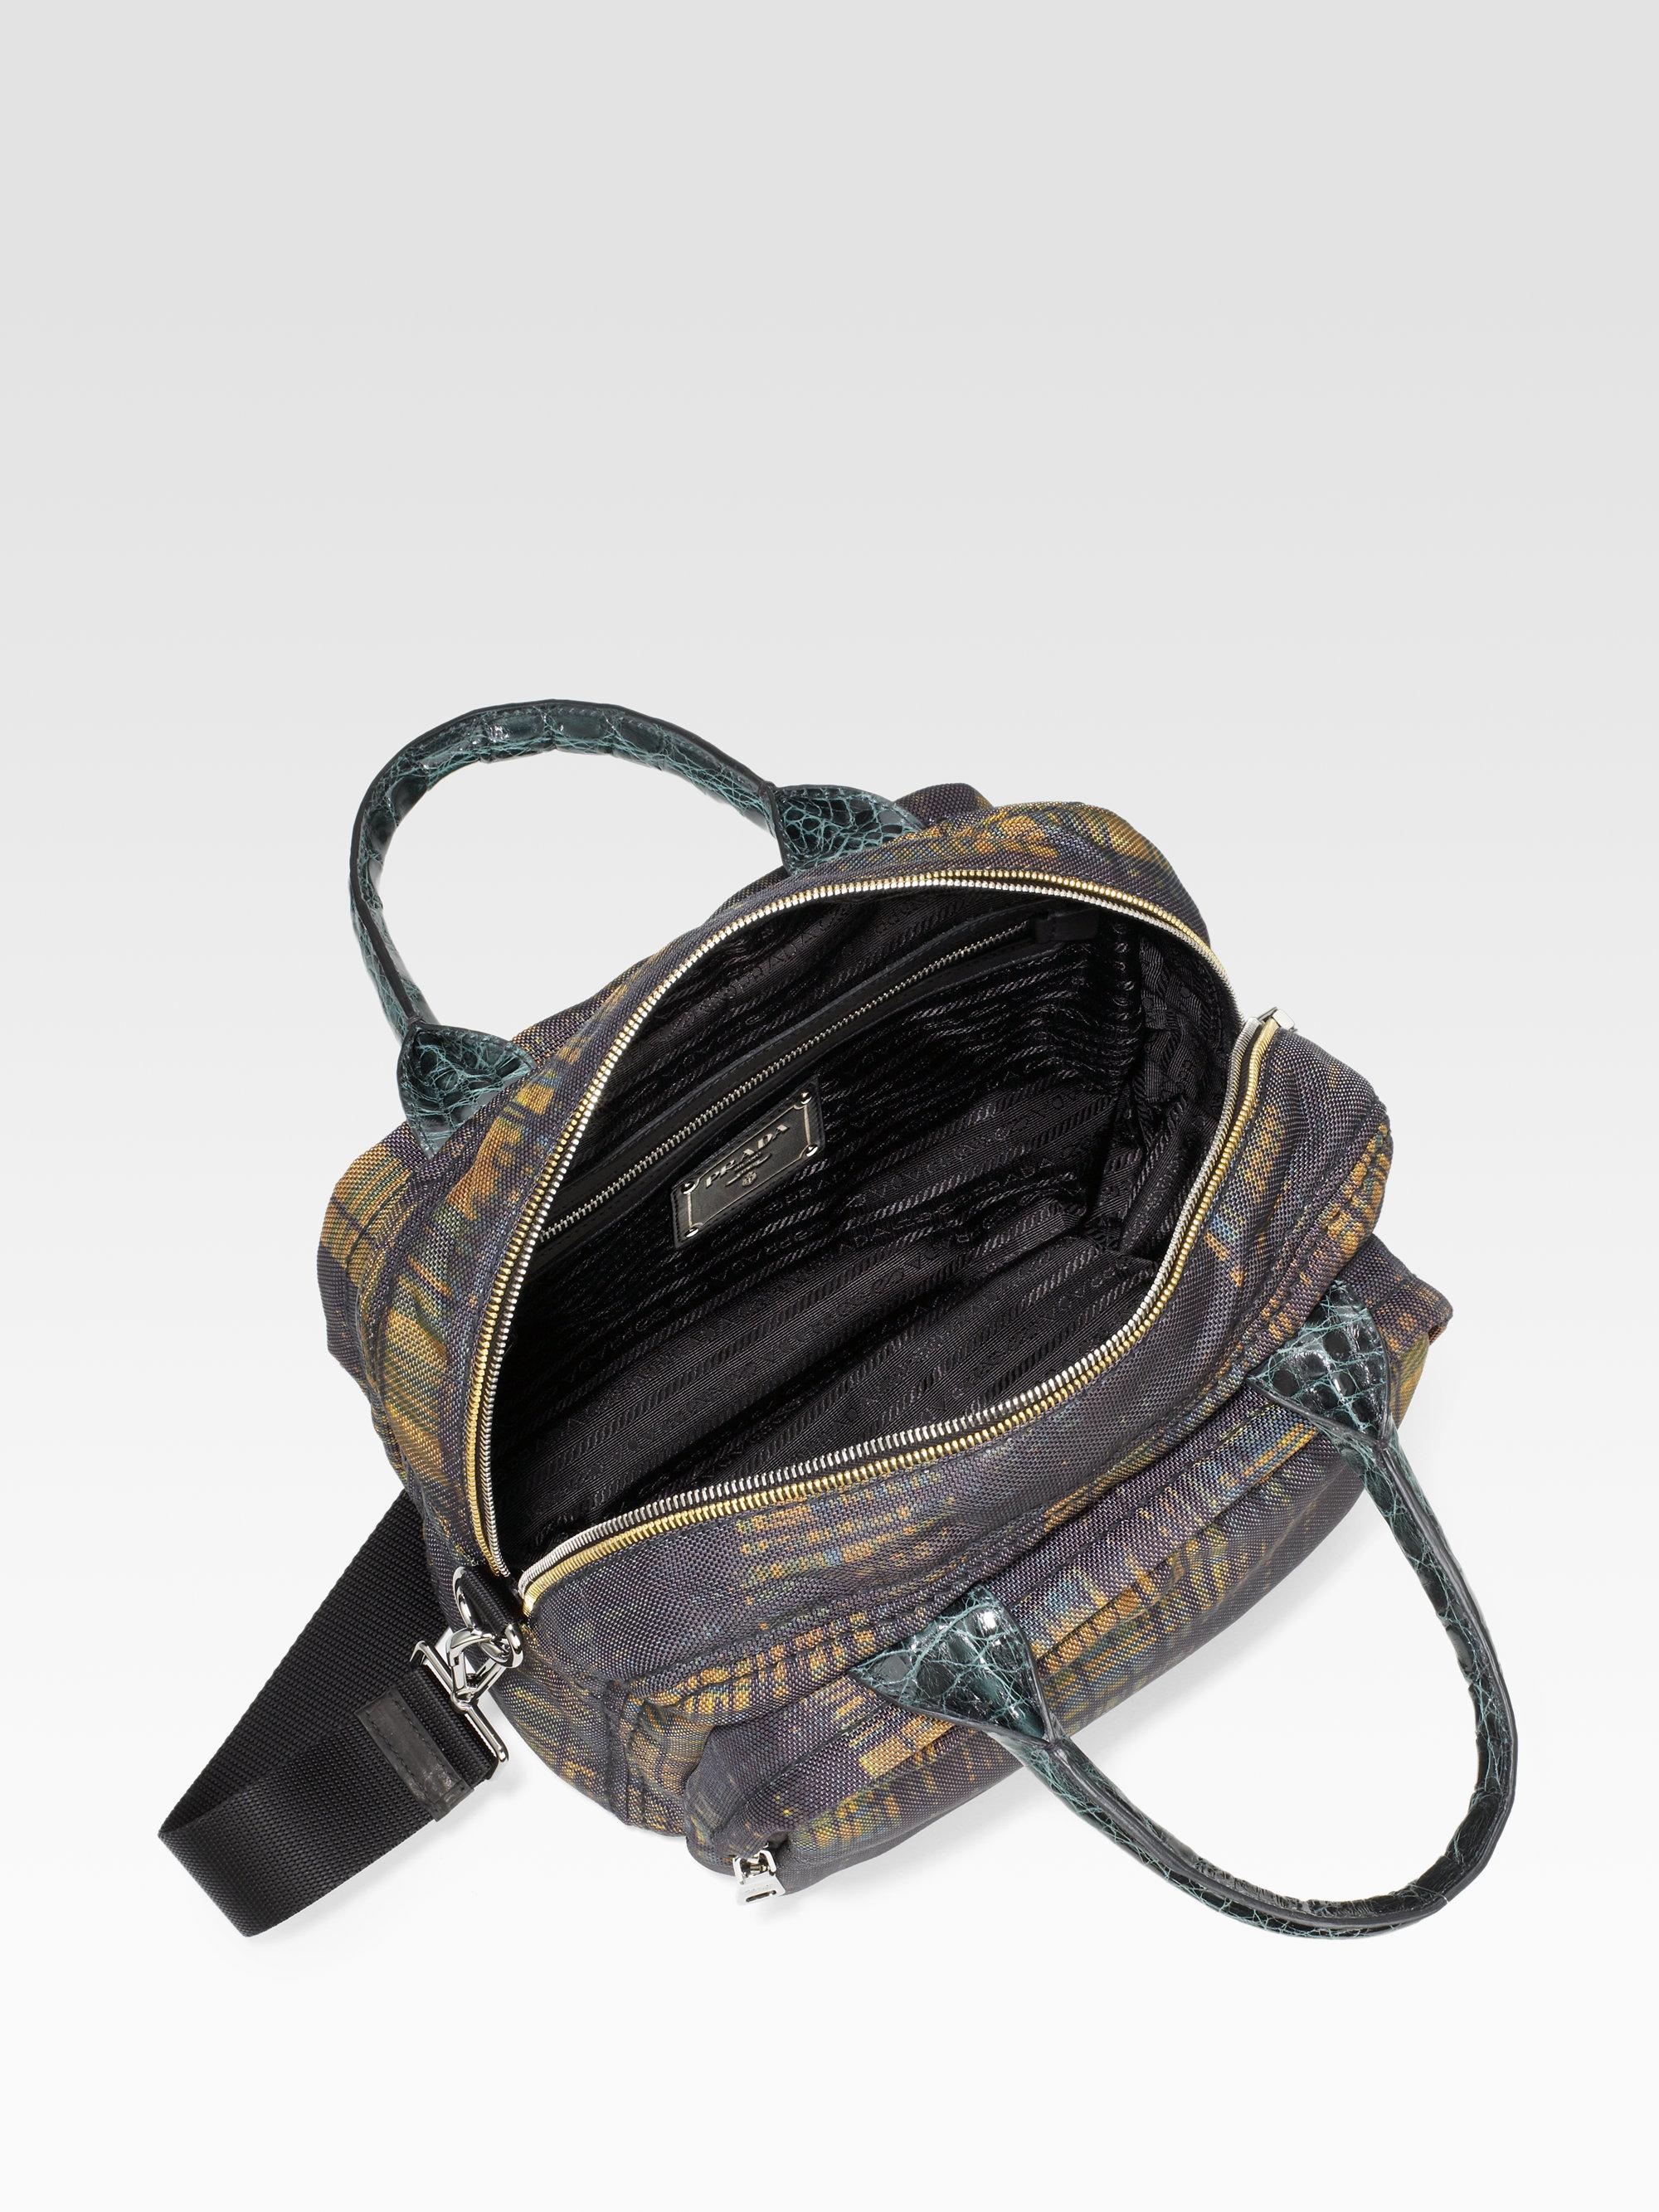 Prada Cordura \u0026amp; Cocco Camera Bag in Multicolor (multi) | Lyst